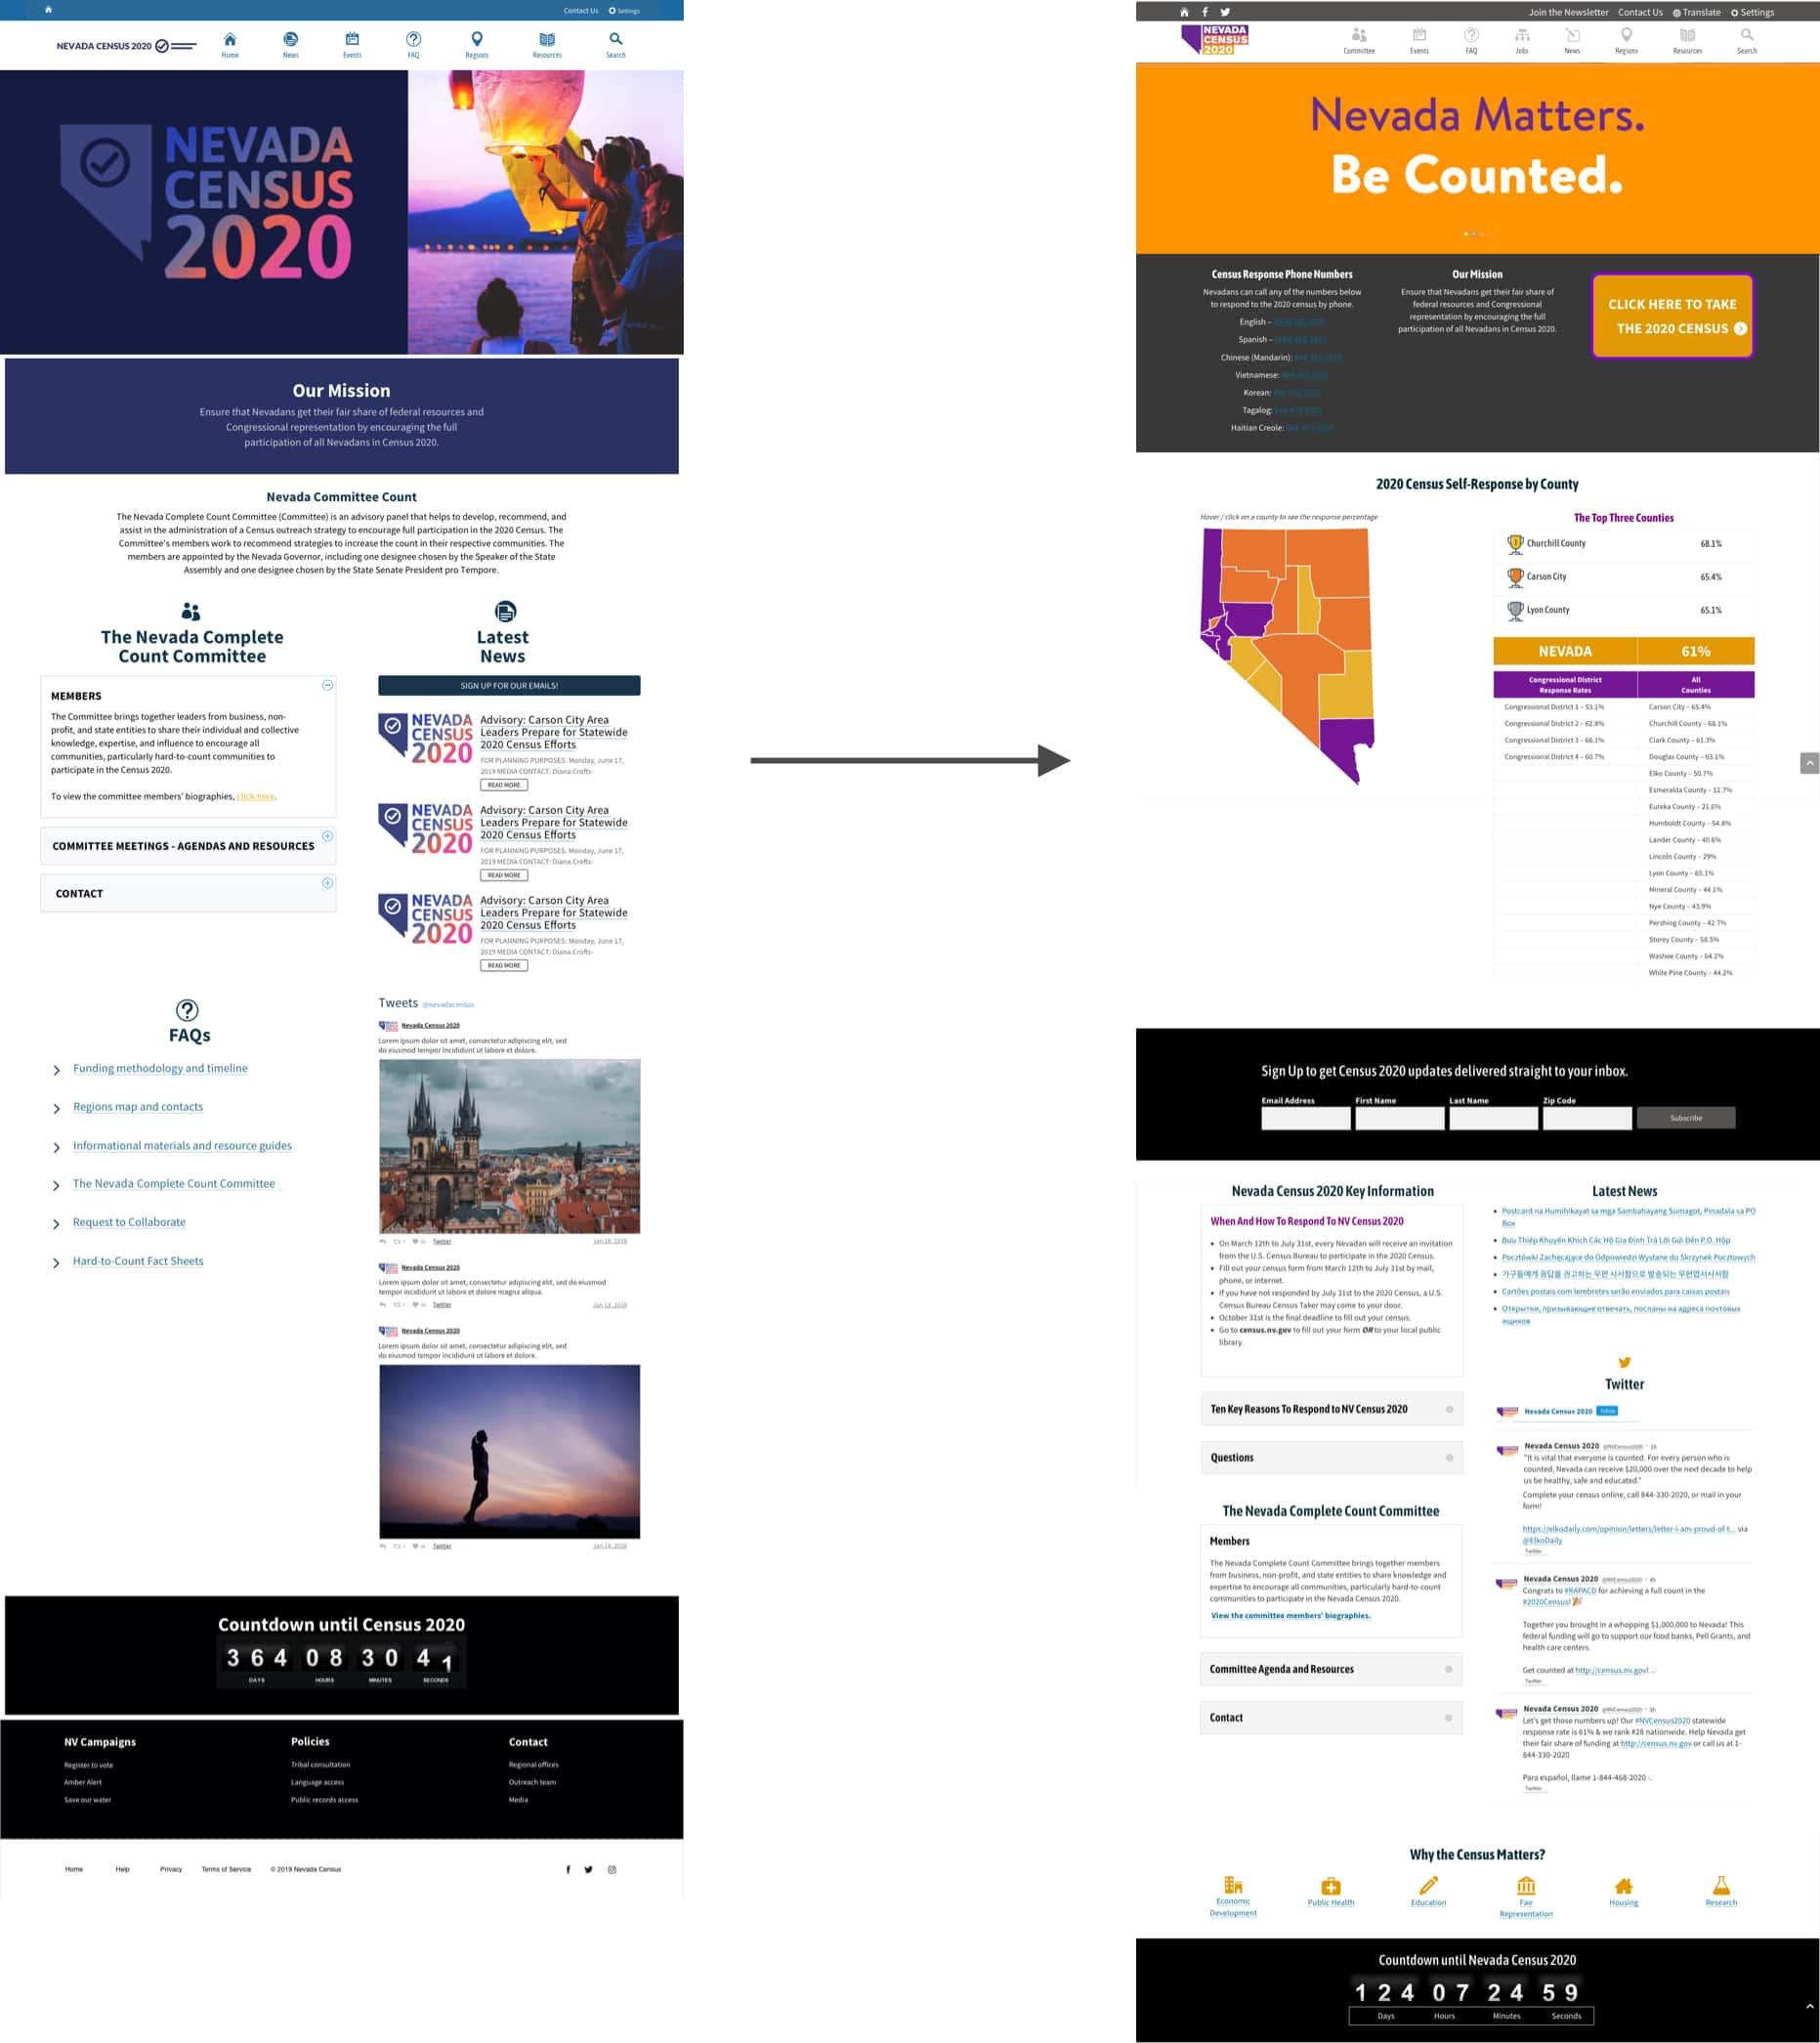 Nevada 2020 Census Website Design Process